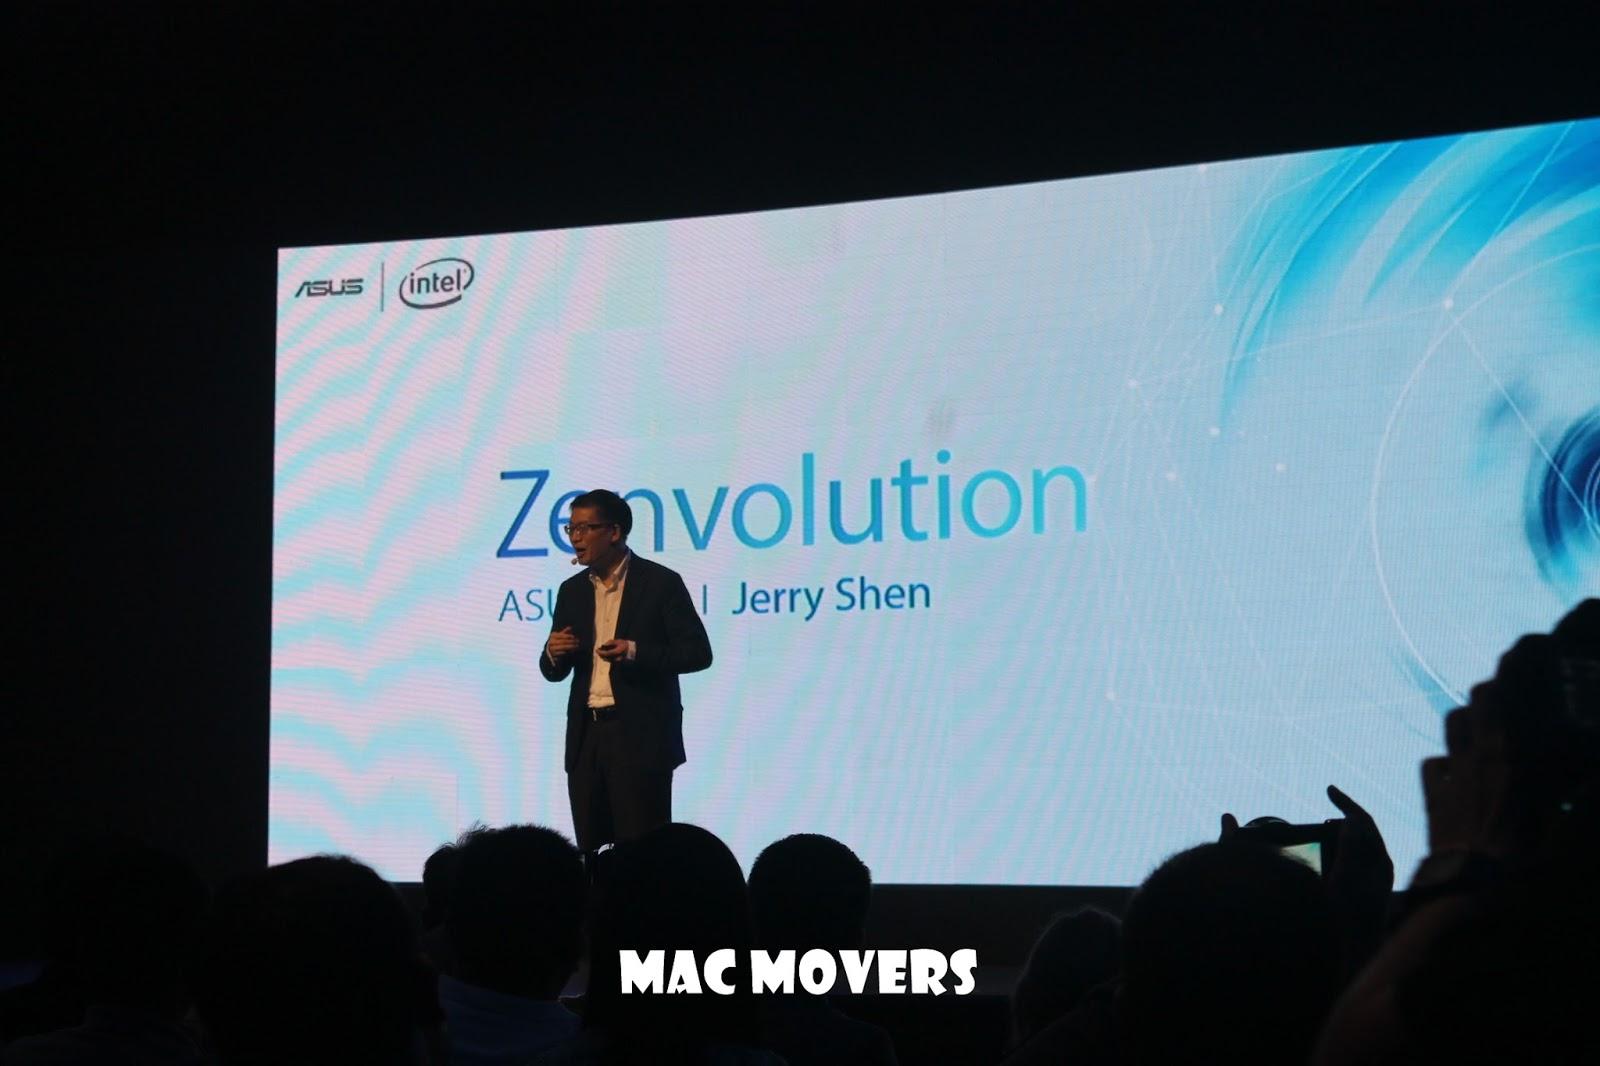 ASUS Presents Zenvolution in the Philippines | Mac\'s IT Trend